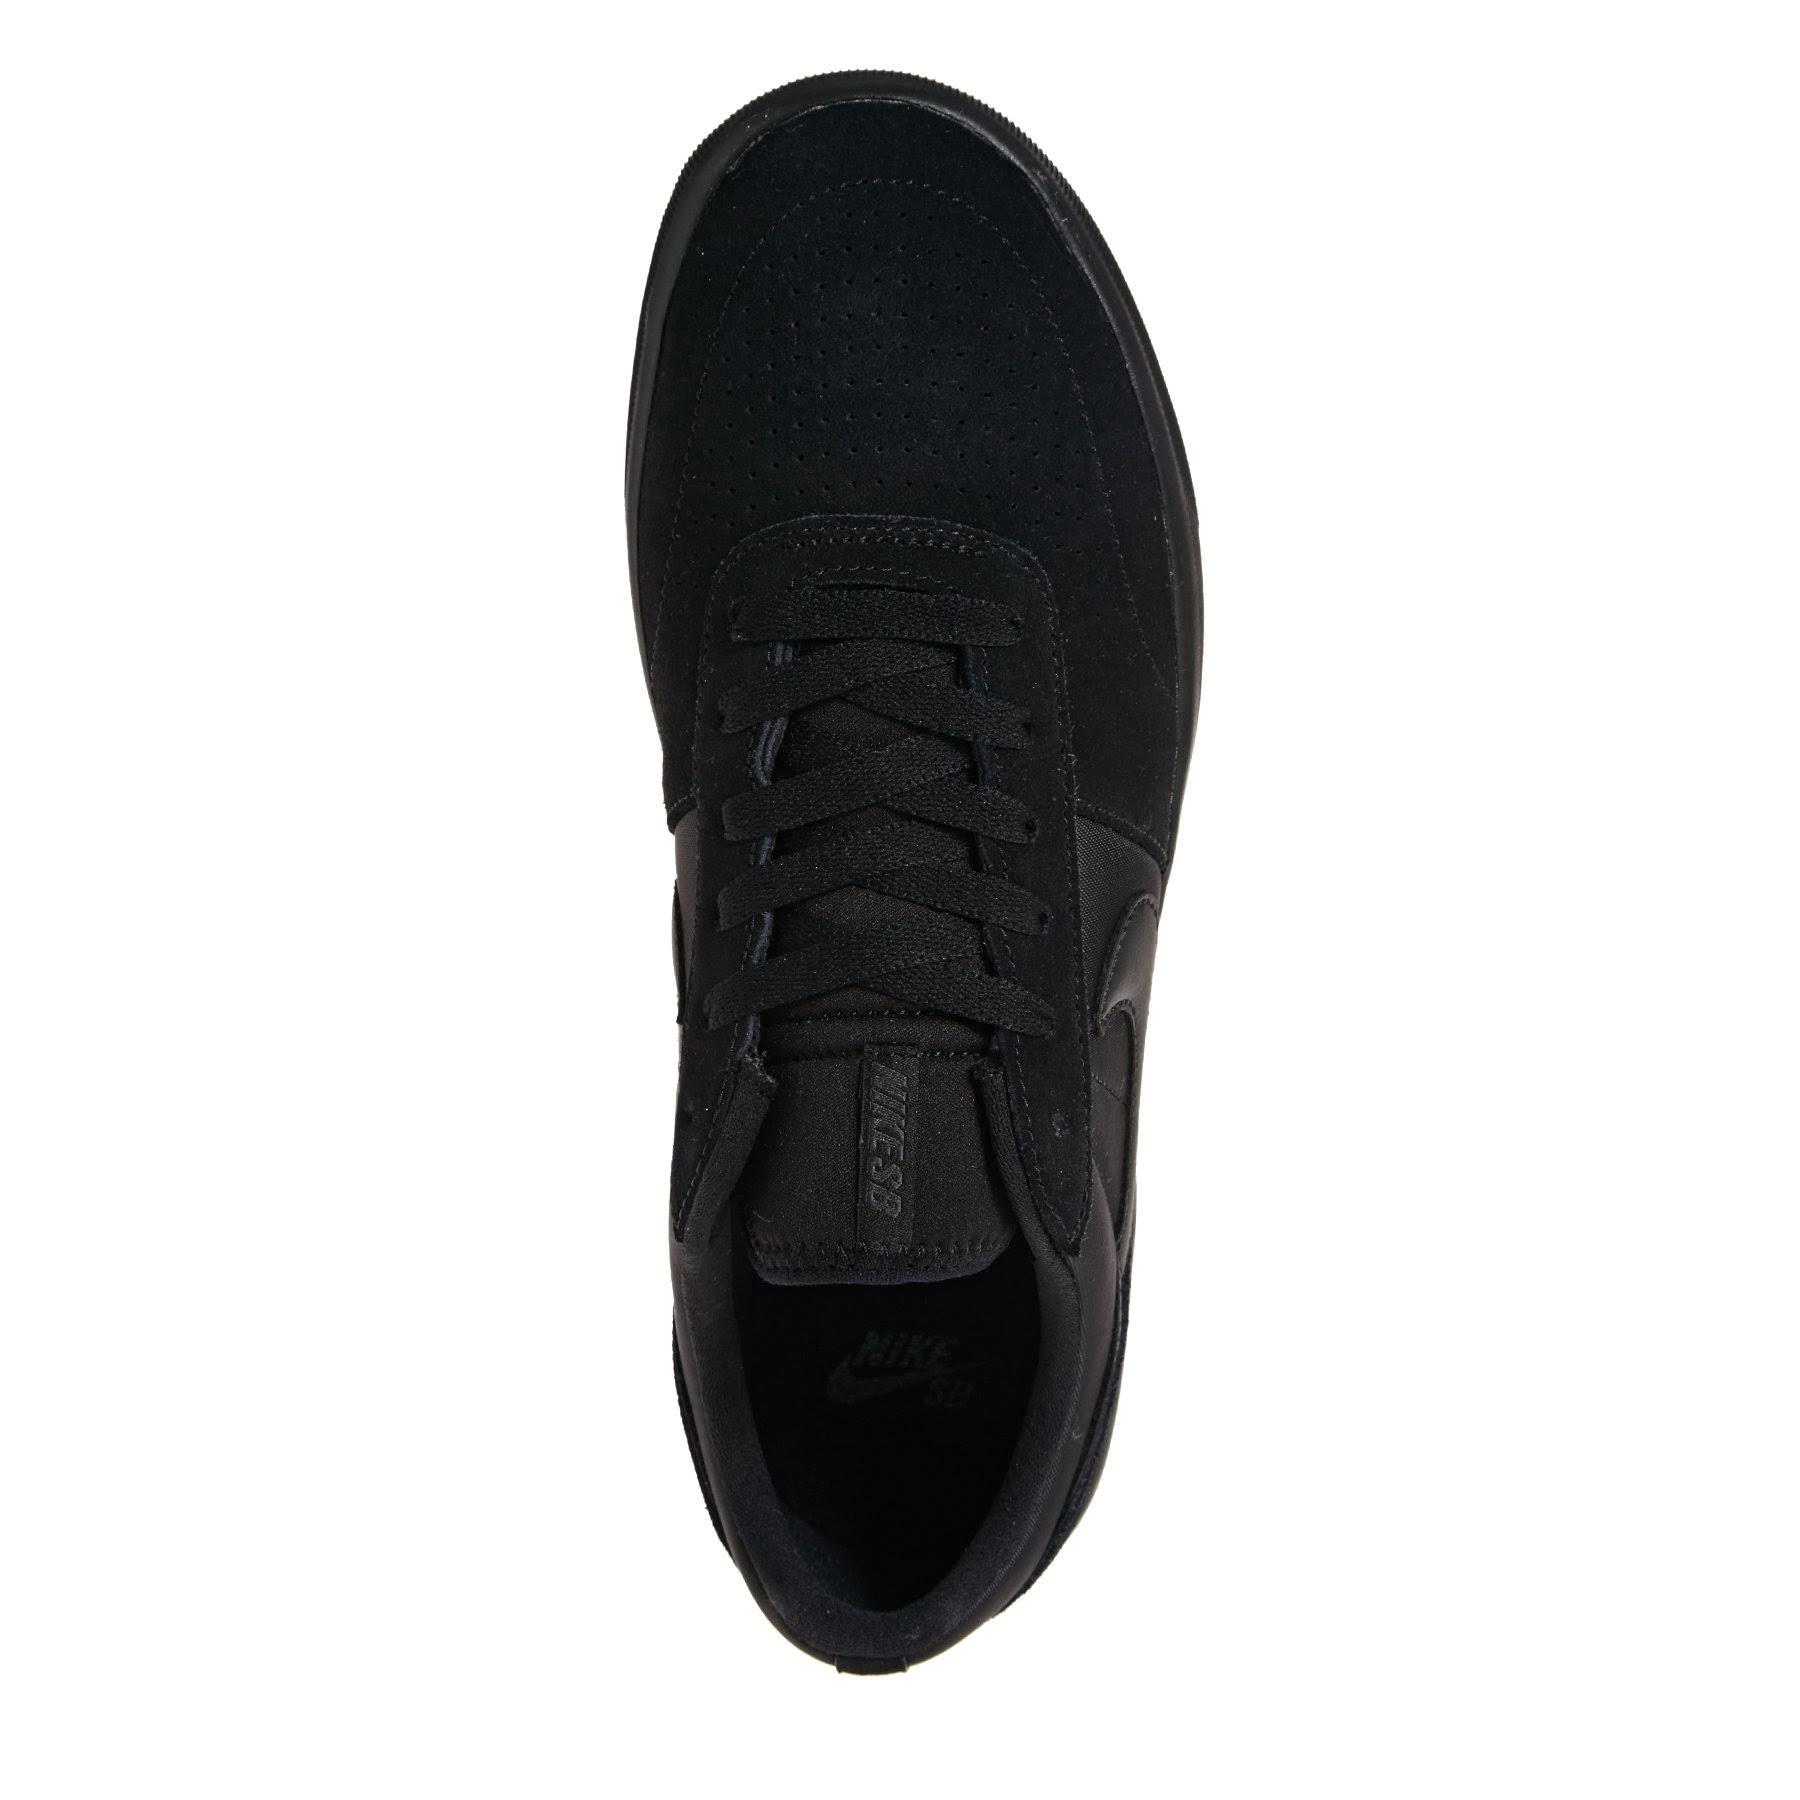 Classic zwartzwart Nike Sb Team schoenen antraciet ukiPXwZOTl